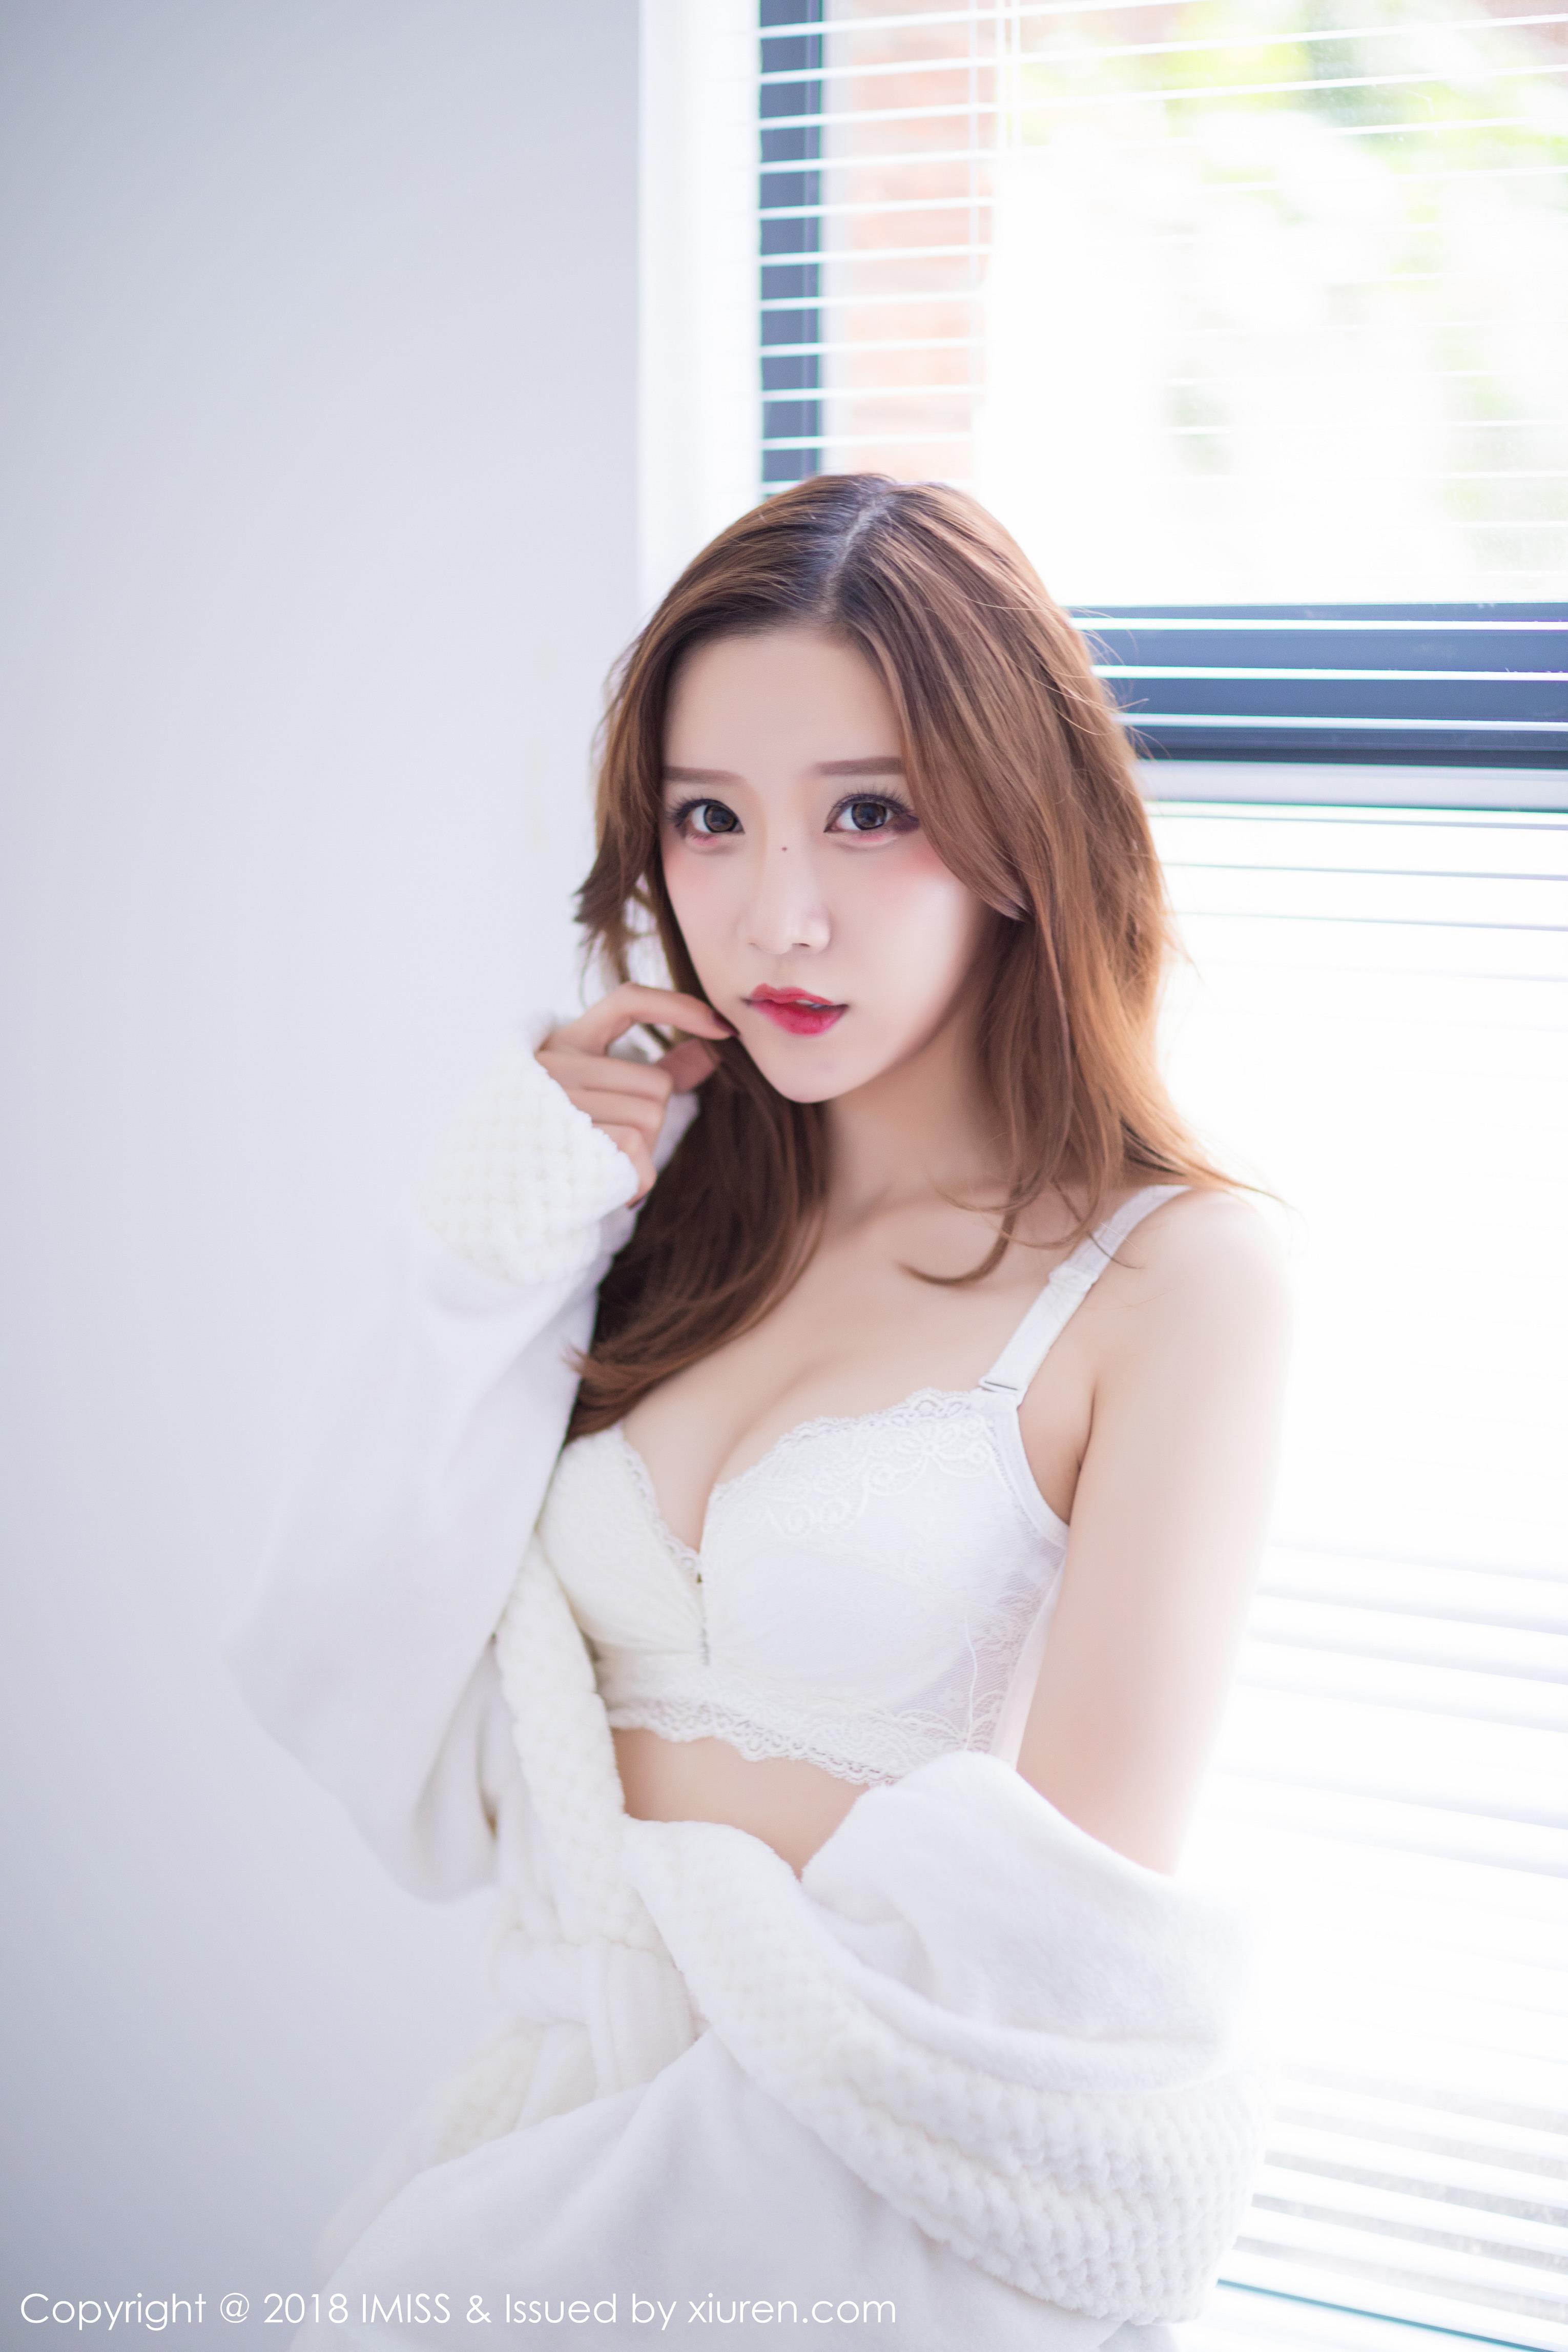 [IMISS爱蜜社]IMS20180502VOL0233 小琳 白色镂空连衣裙与白色蕾丝内衣性感私房写真集